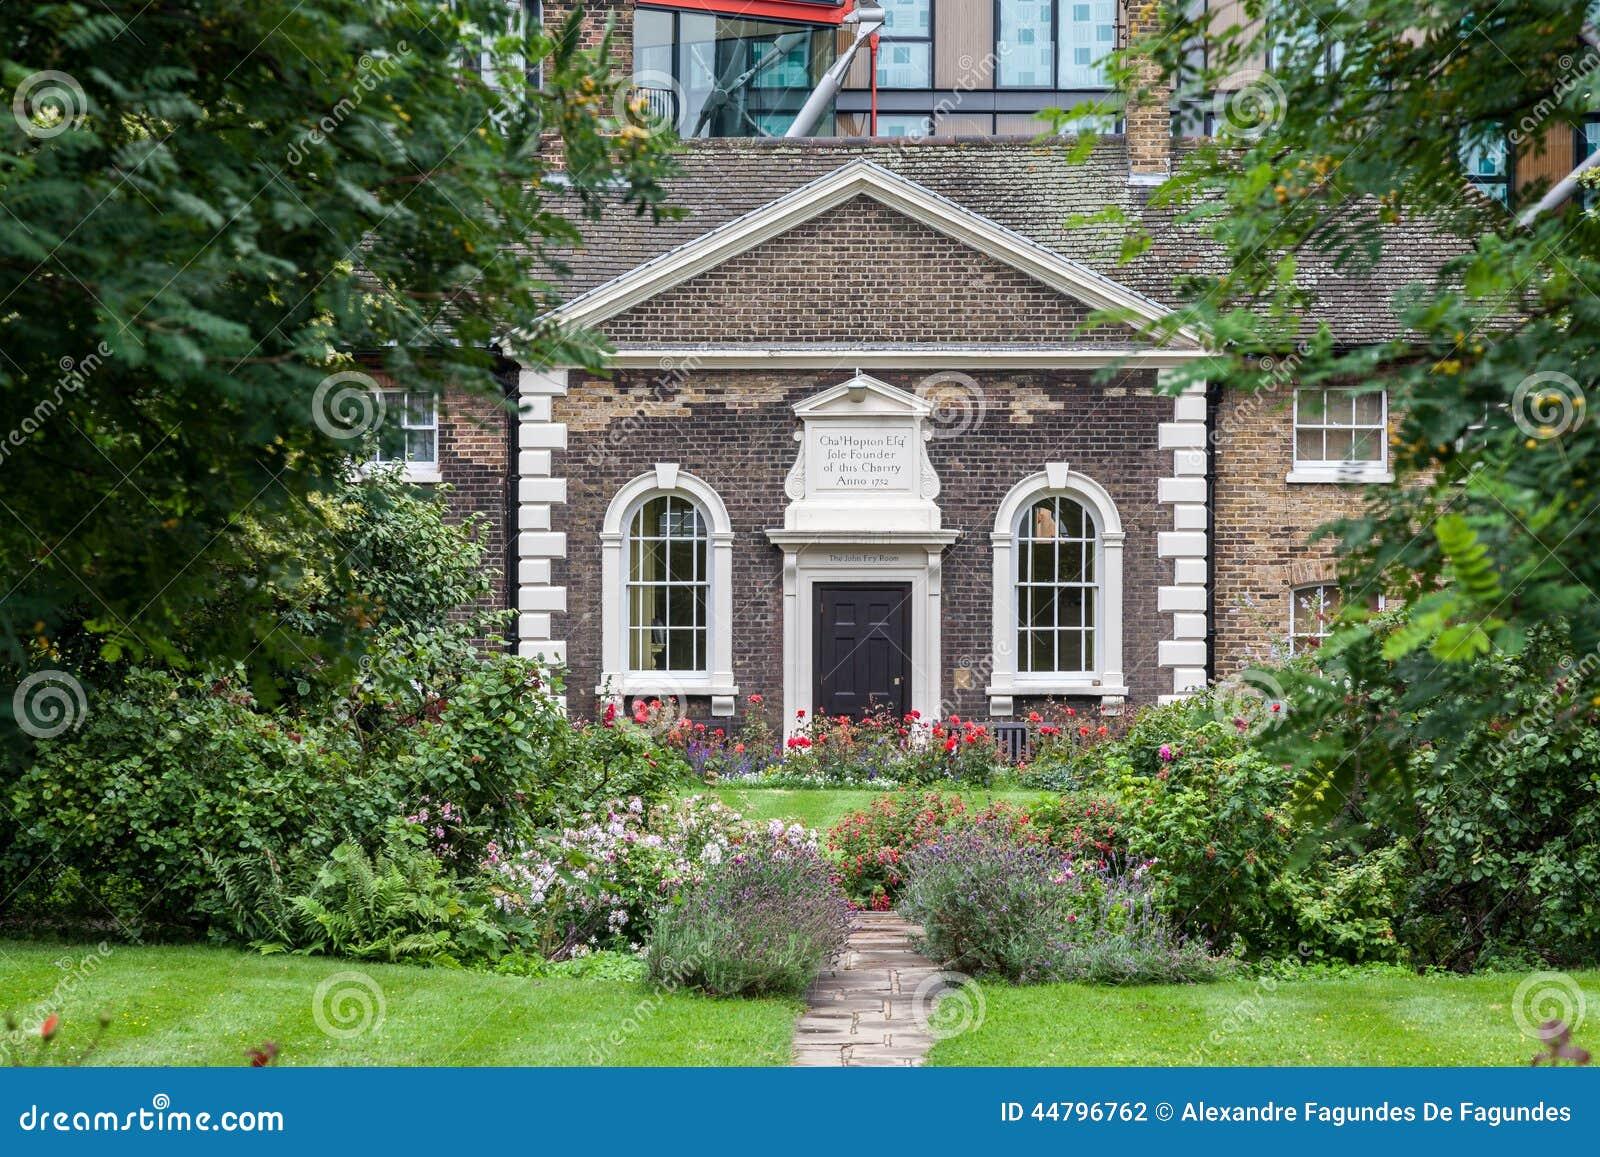 Typical British Brick House London England Editorial